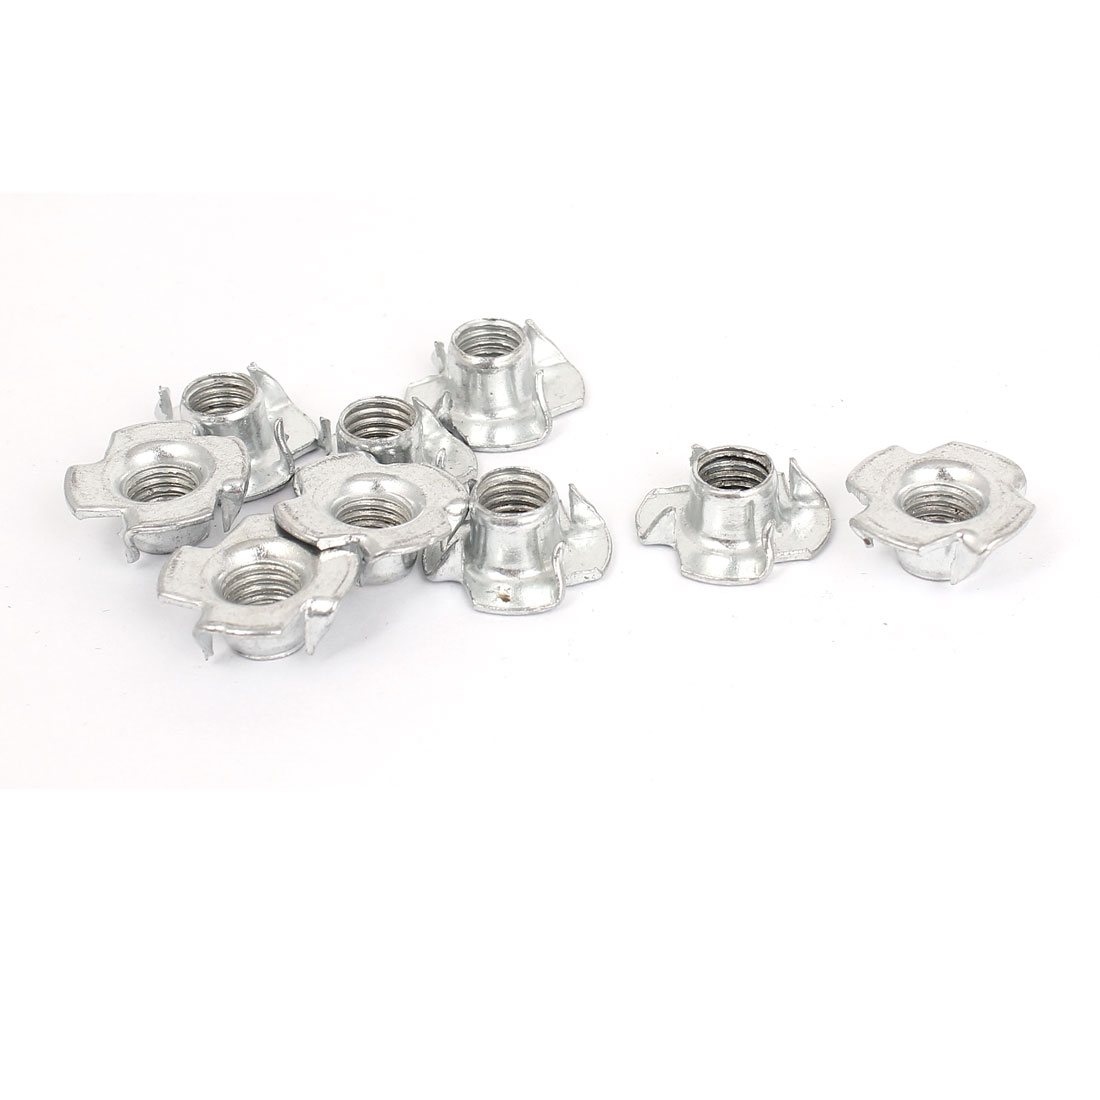 9 Pcs M8x1.25mmx20mm T Nut Zinc Plated 4 Prong Tee Nuts Fasteners